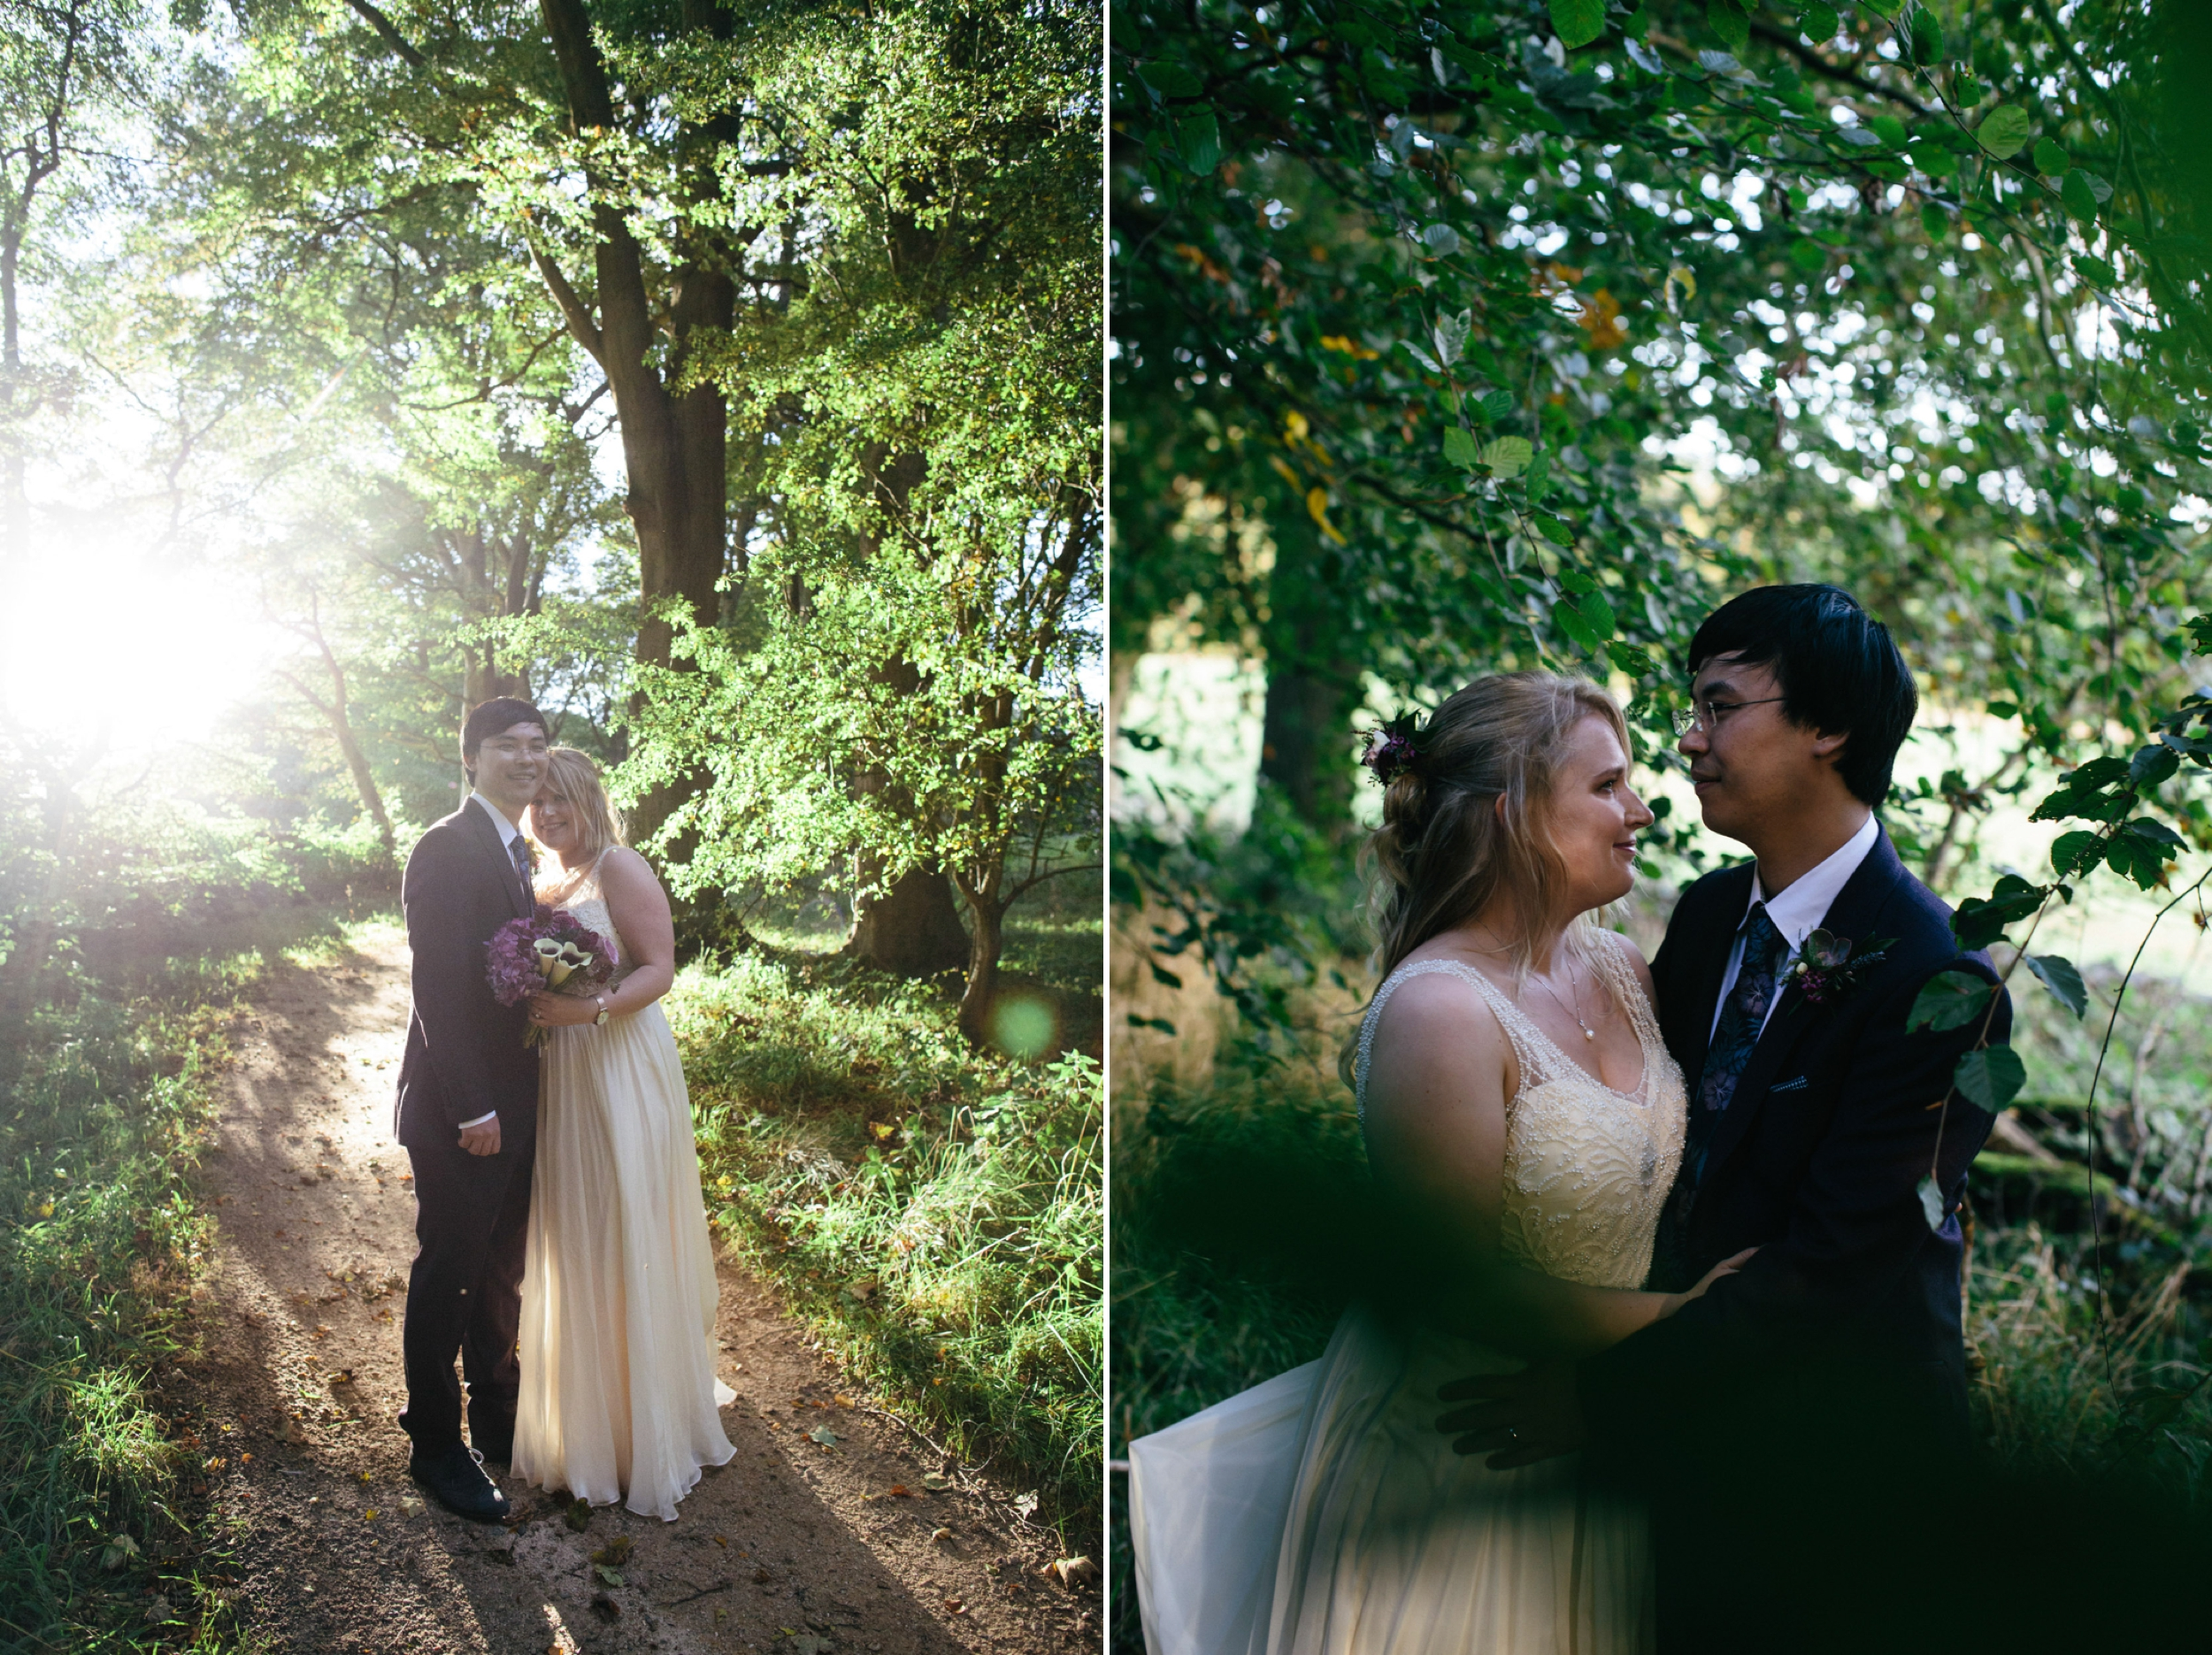 Quirky Wedding Photographer Edinburgh Jupiter Artland -39a.jpg